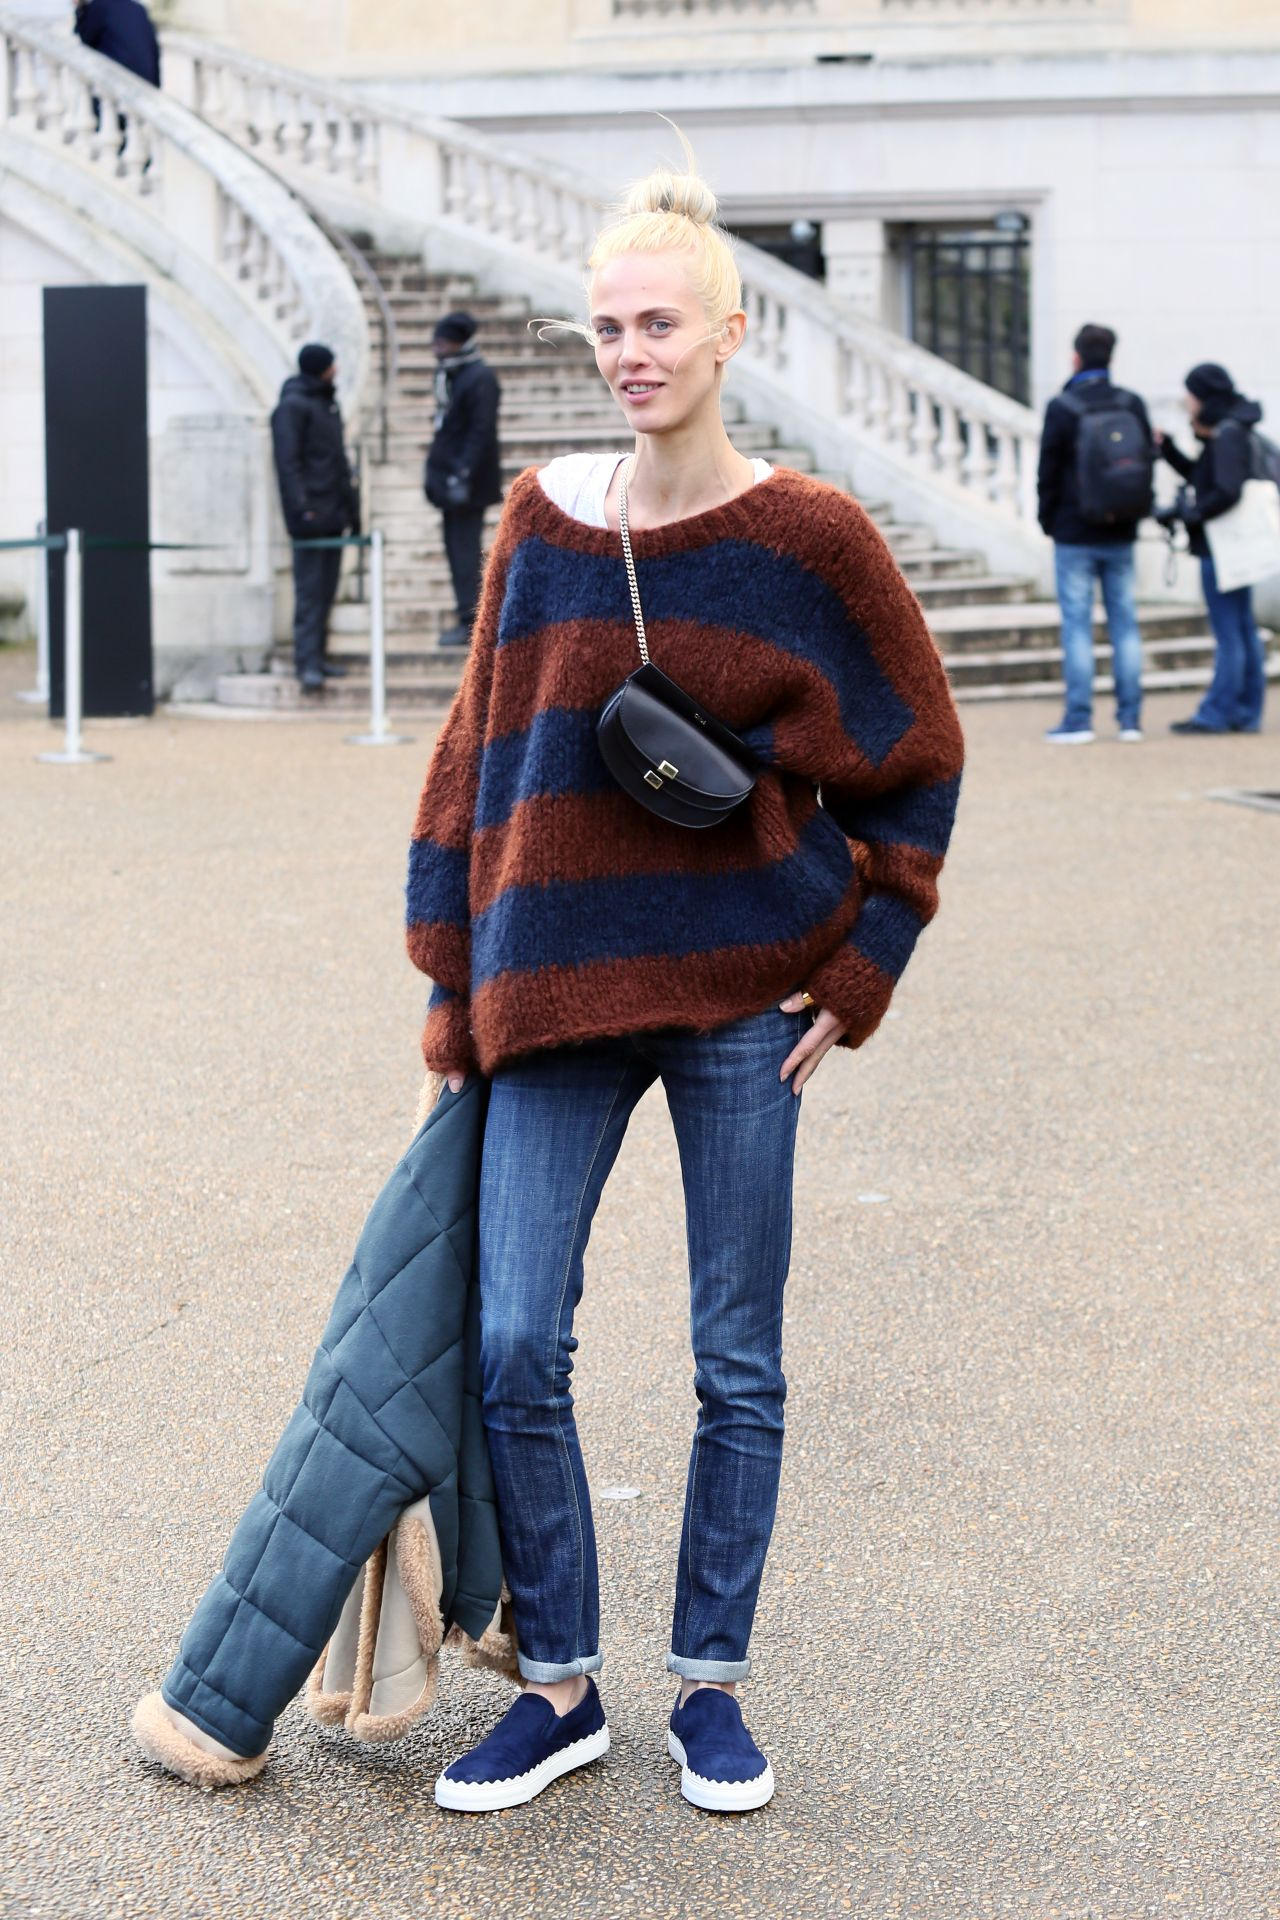 aymeline-valade-at-chloe-show-paris-fashion-week-womenswear-fall-winter-2016-2017-4